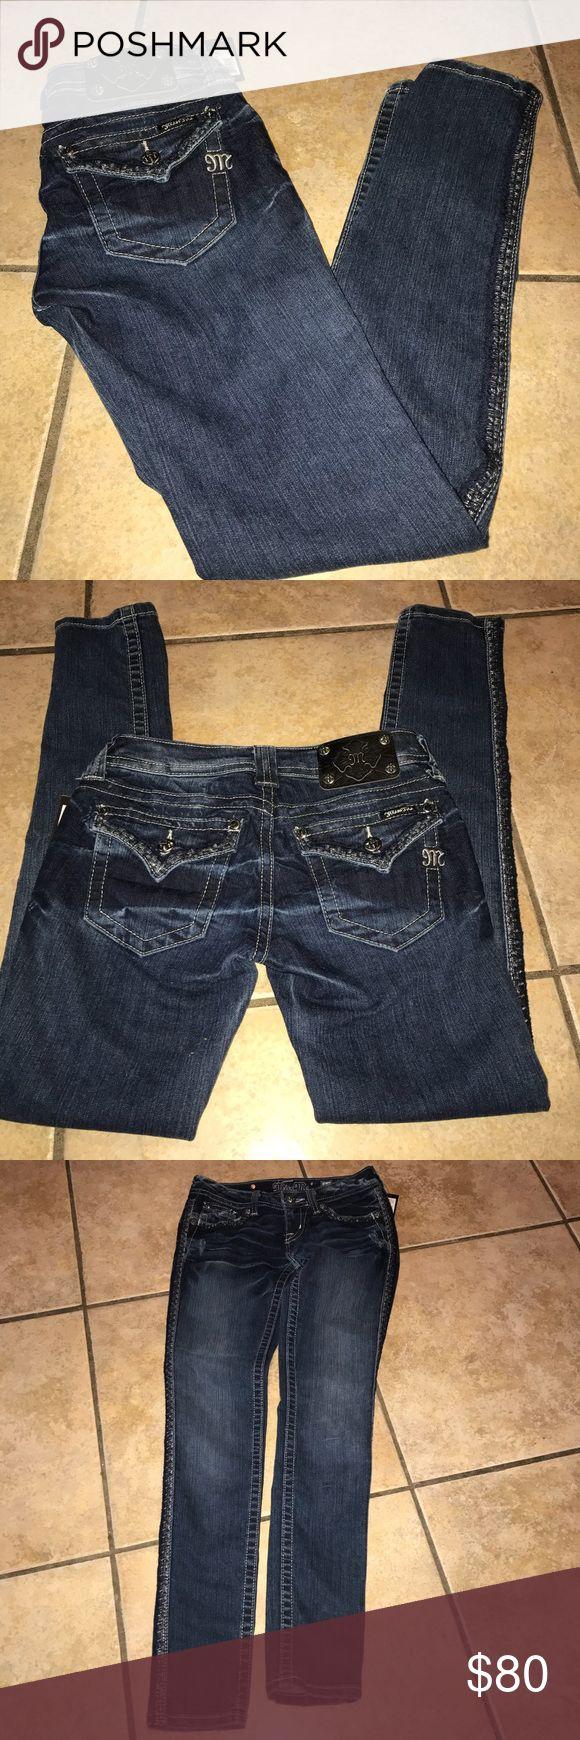 Miss Me Skinny Jeans NWT Size 26 Miss Me Skinny Jeans NWT Size 26 approx 30.5 inch inseam Miss Me Jeans Skinny